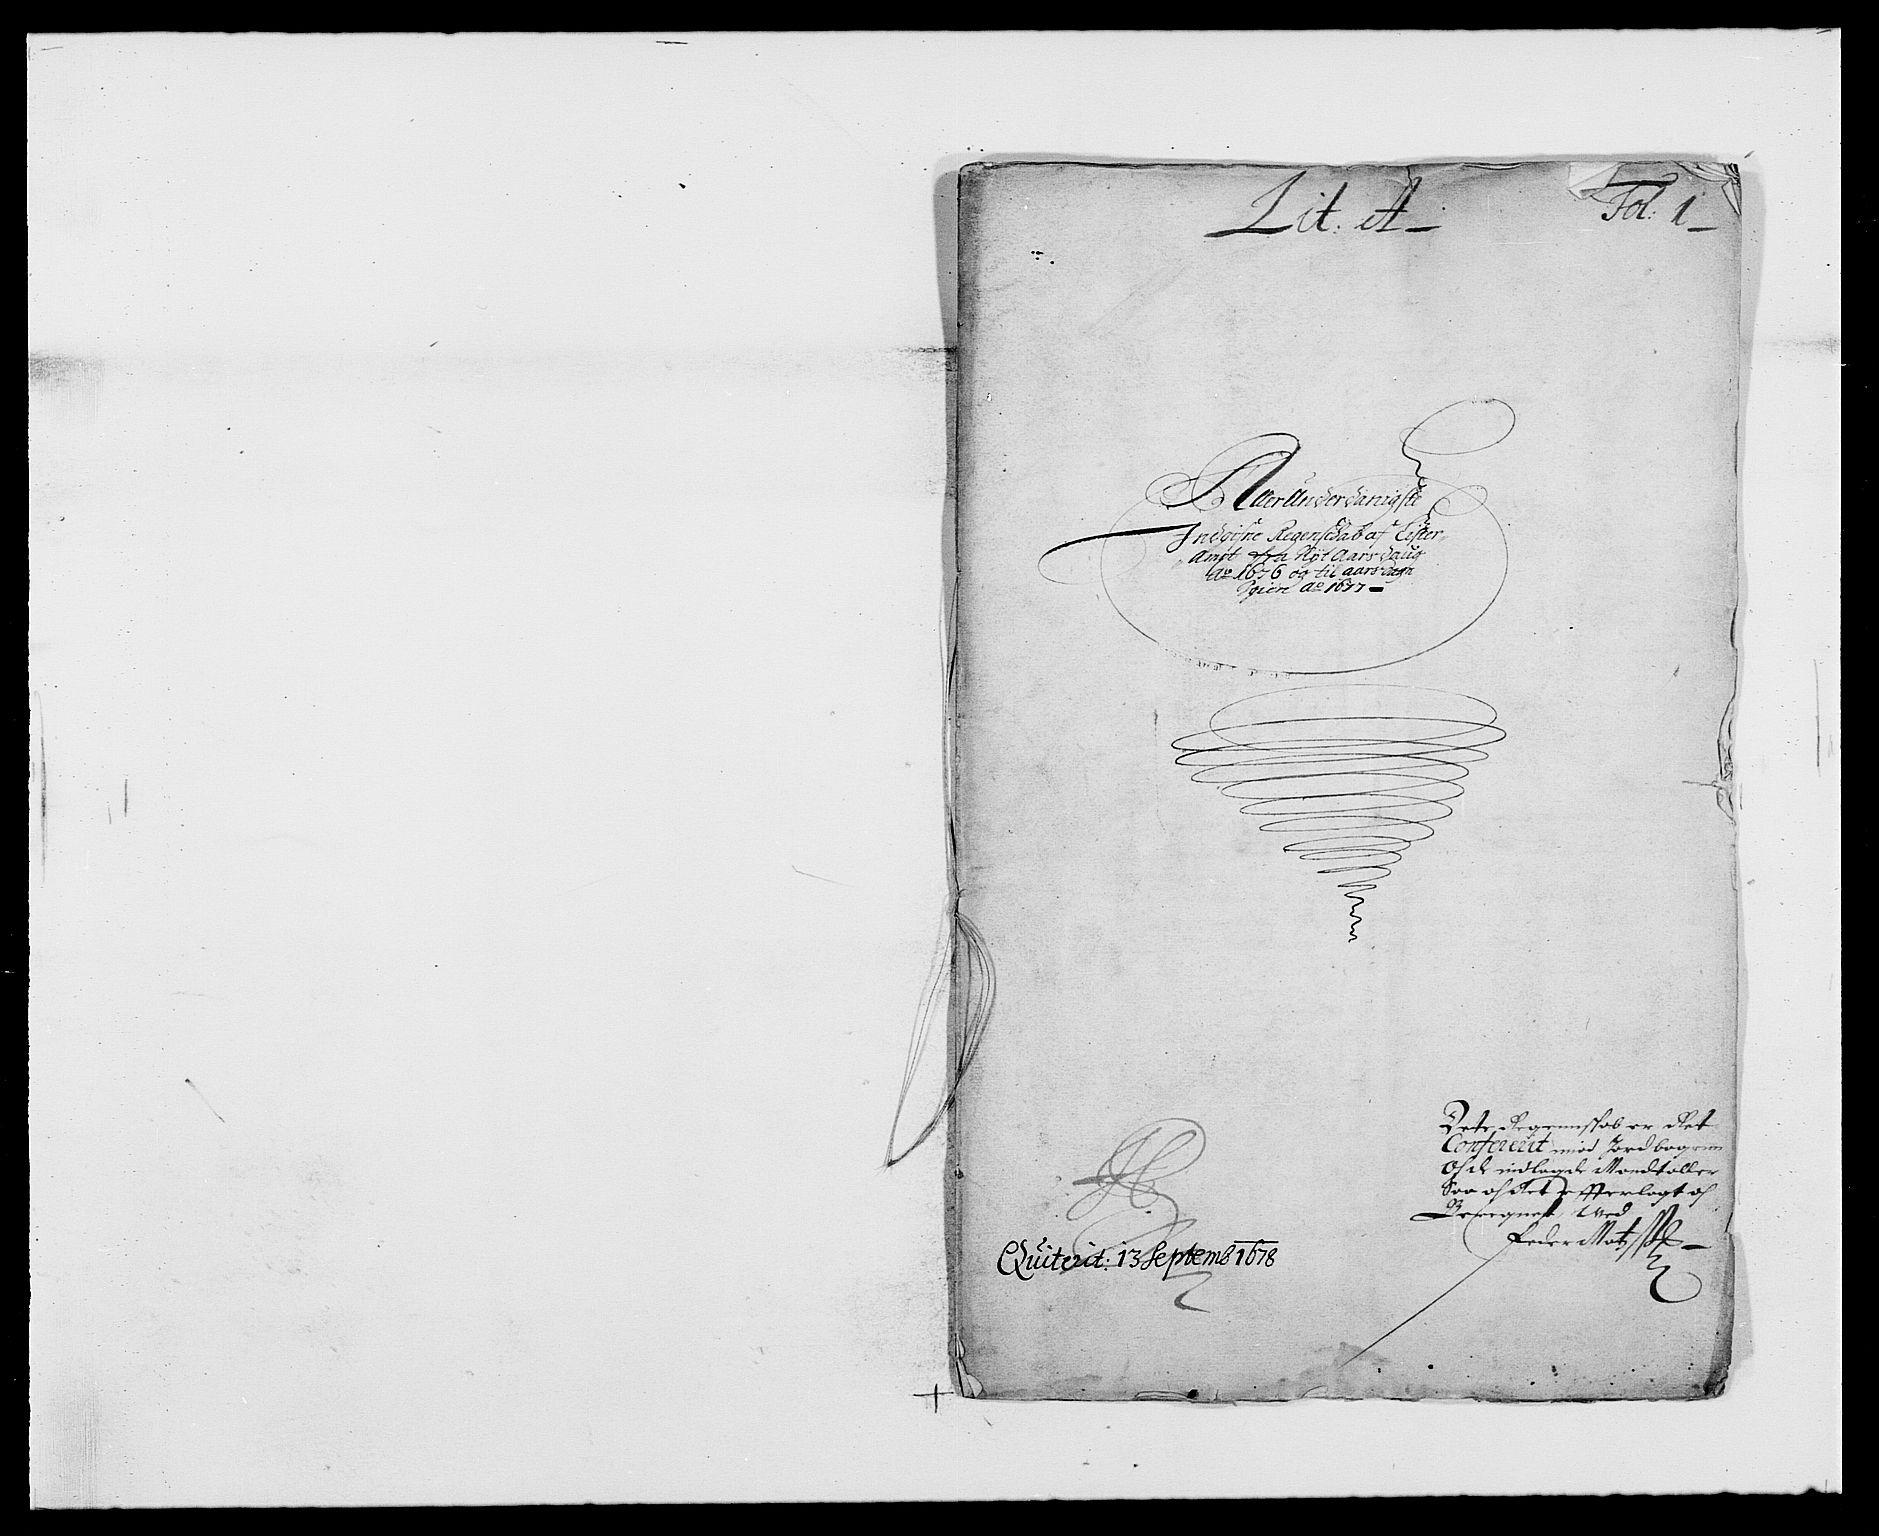 RA, Rentekammeret inntil 1814, Reviderte regnskaper, Fogderegnskap, R41/L2529: Fogderegnskap Lista, 1675-1676, s. 114